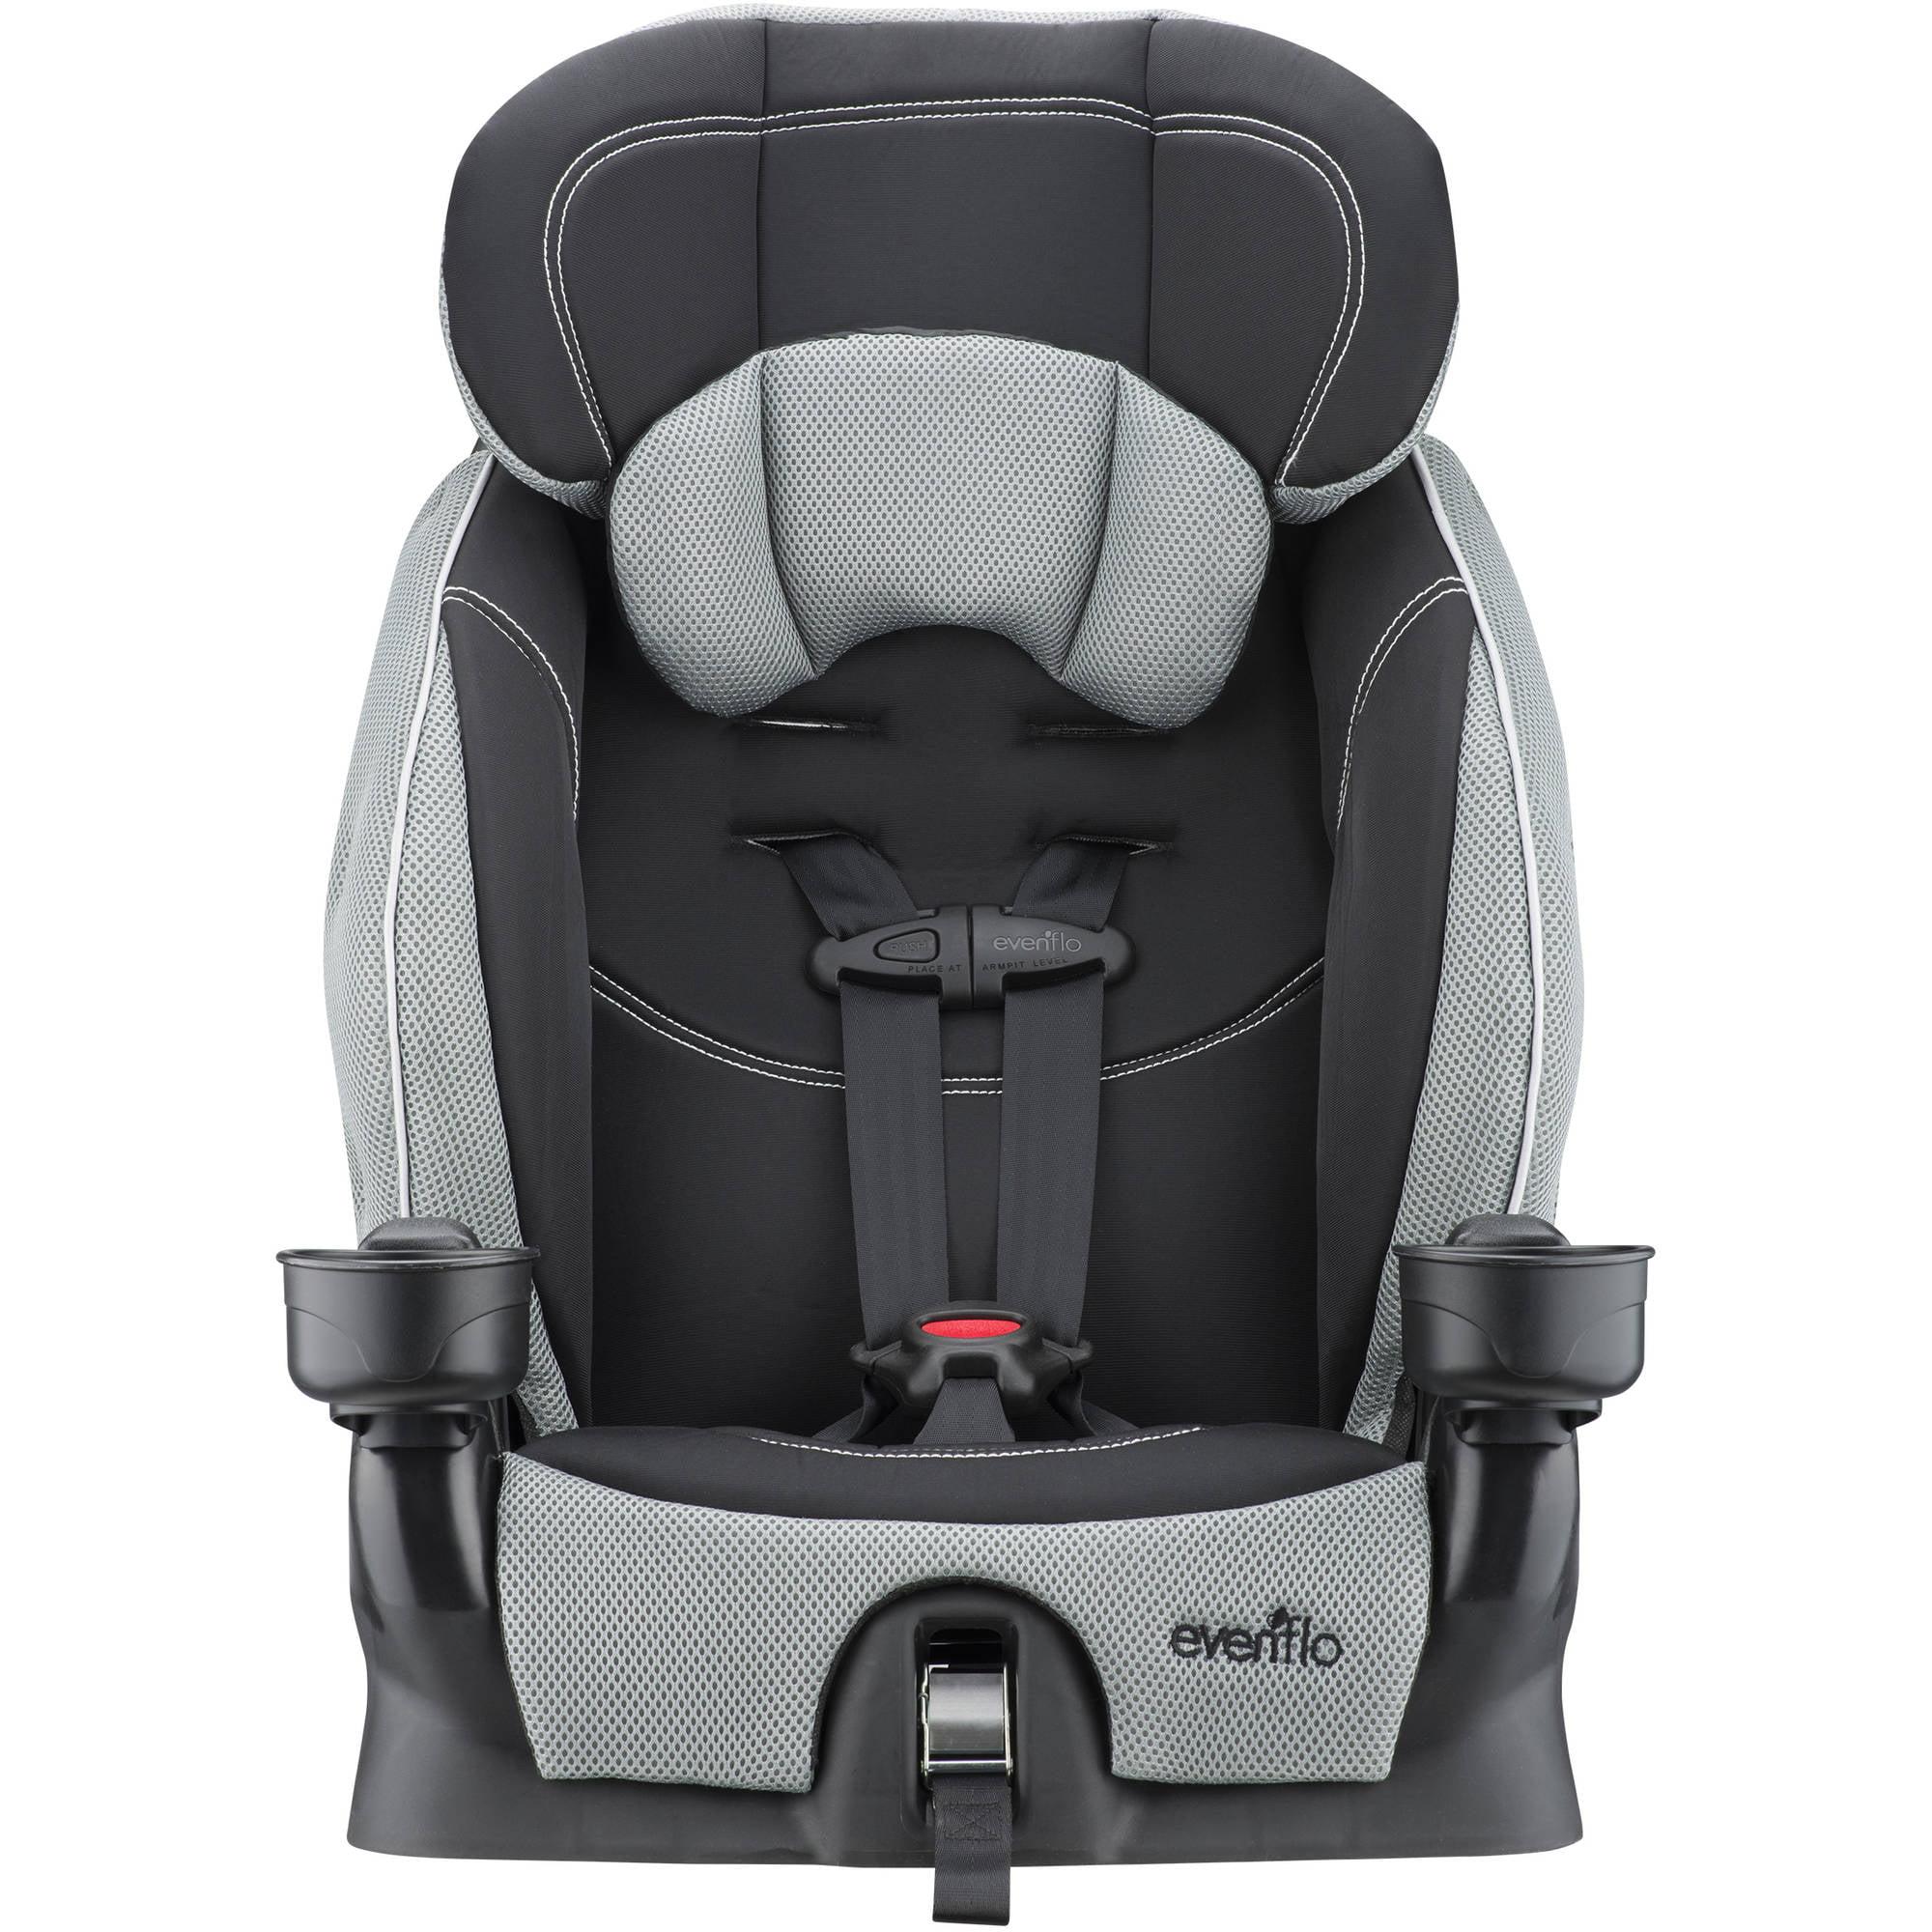 Baby flamingo car interior design - Evenflo Advanced Chase Lx Harness Booster Seat Dotty Flamingo Walmart Com